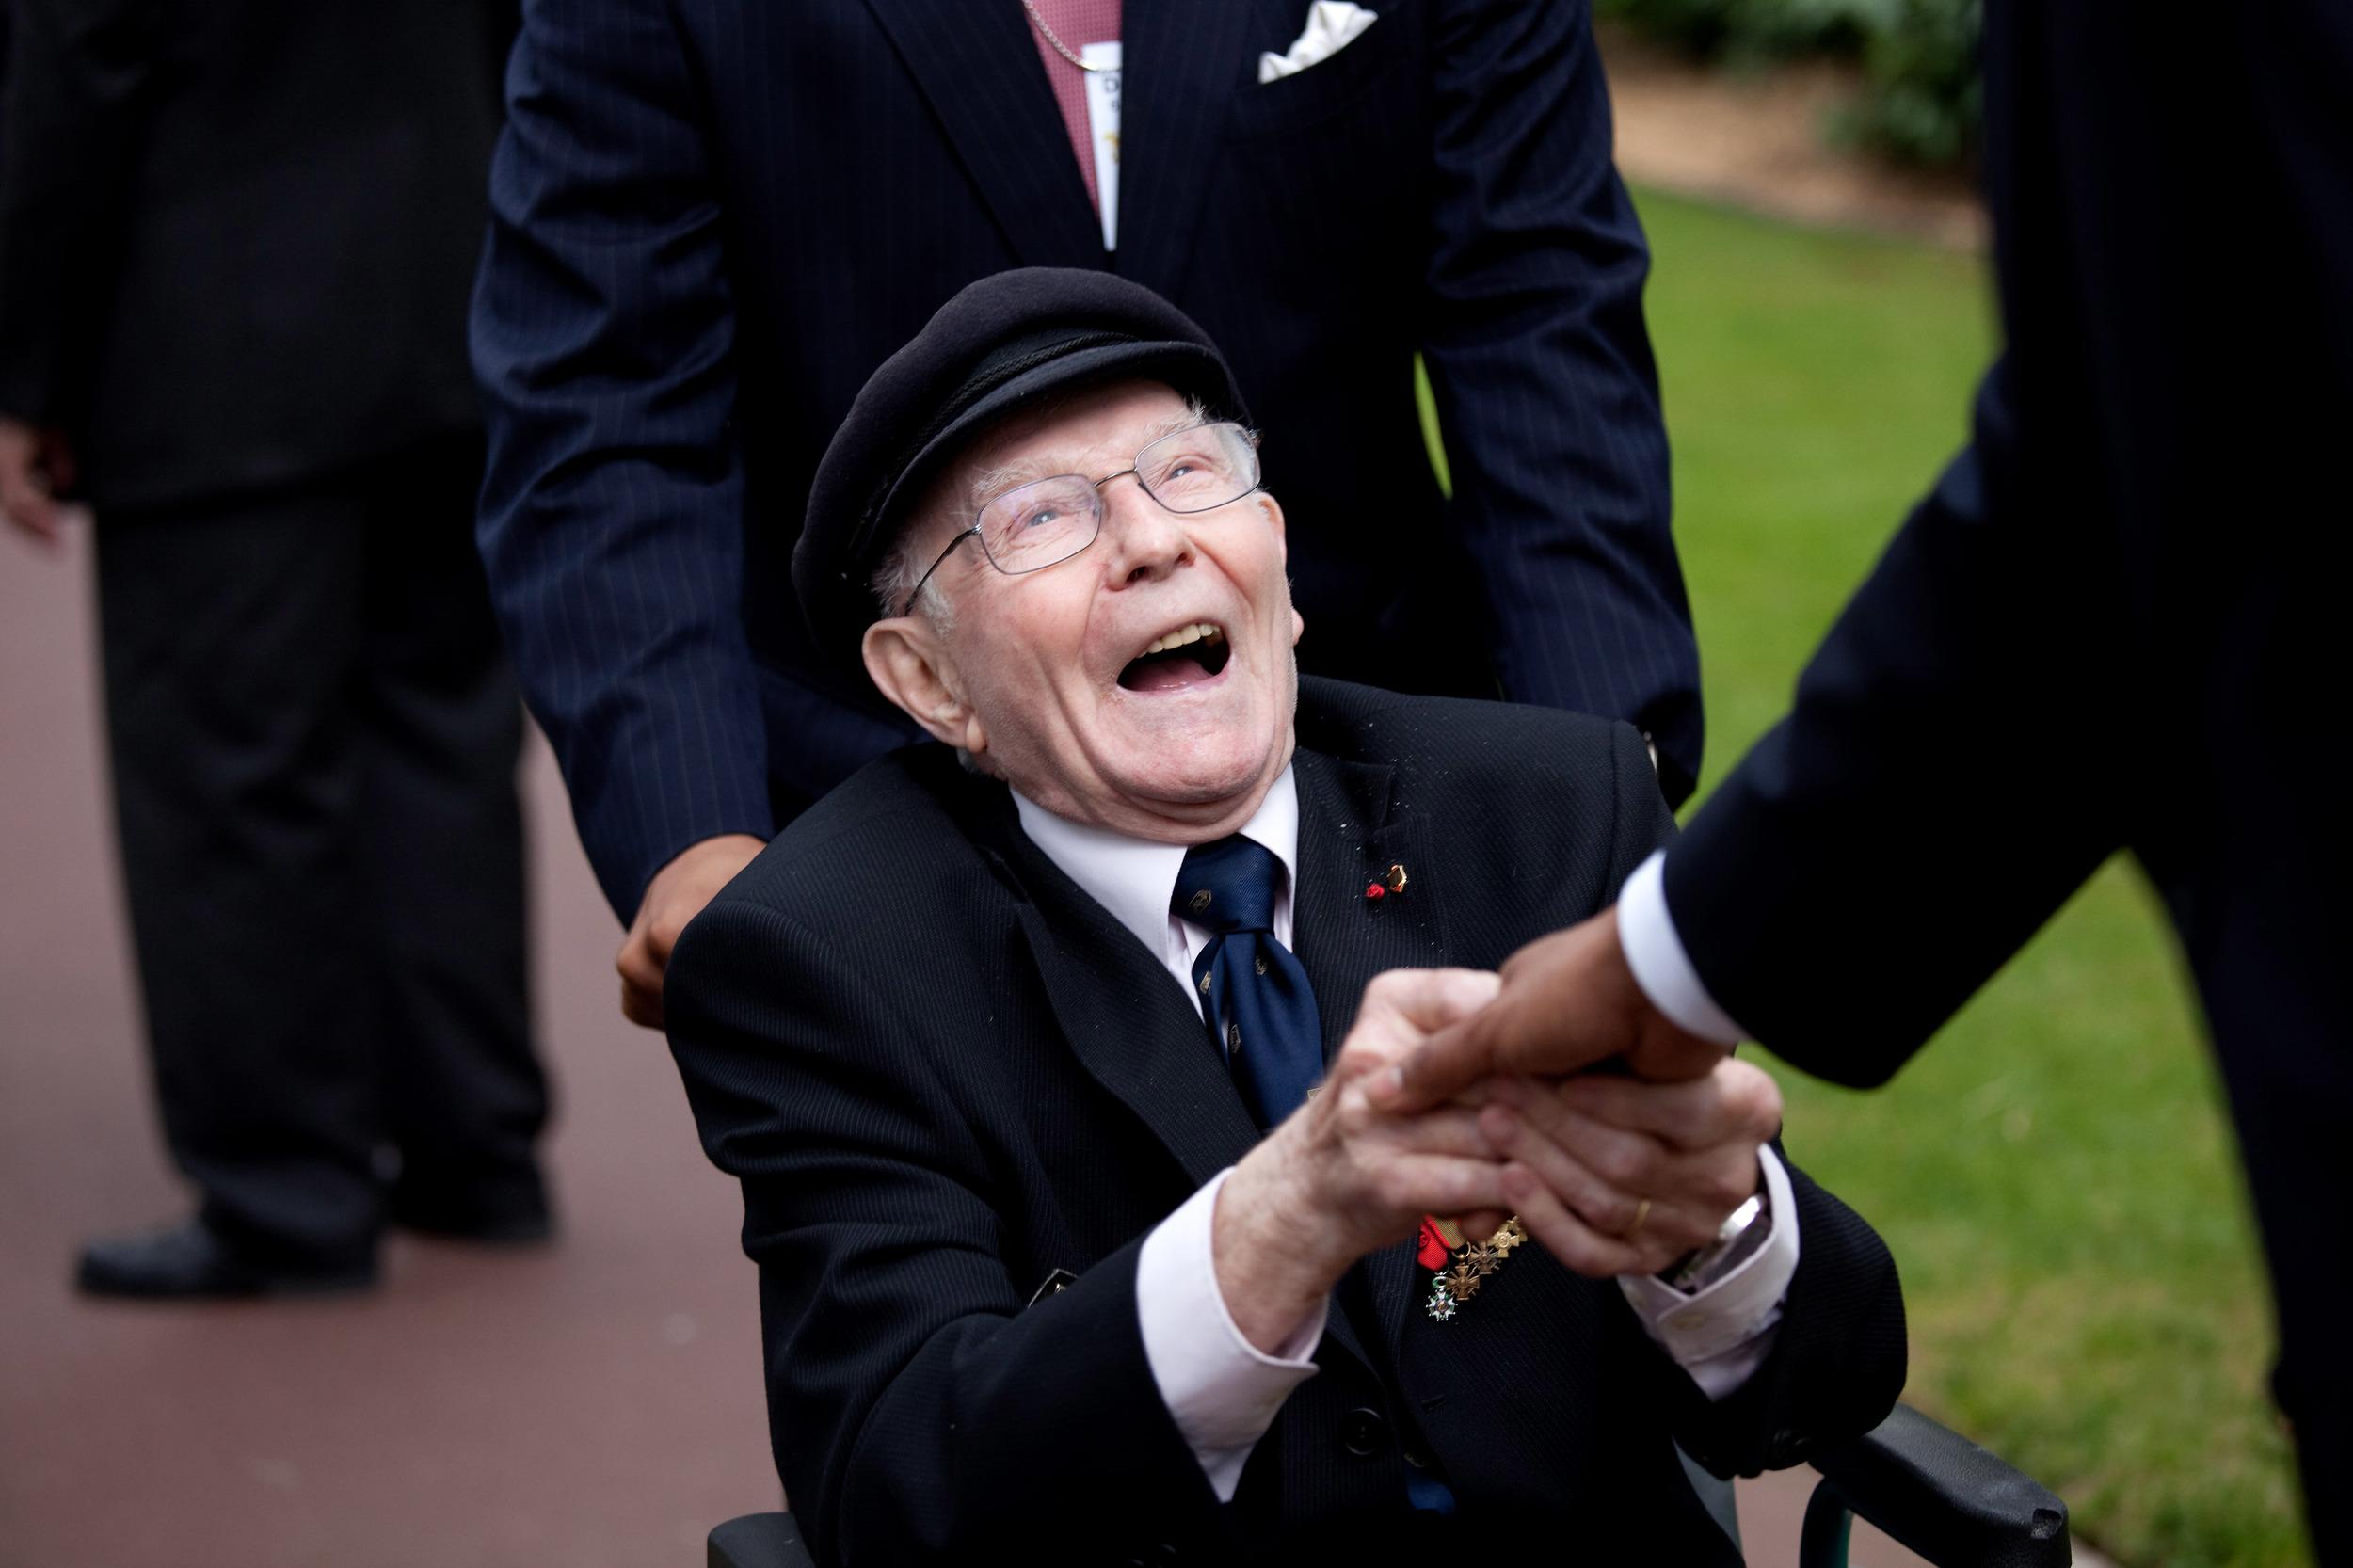 0519-0908-1001-2534_military_veteran_in_a_wheelchair_shaking_hands_o.jpg